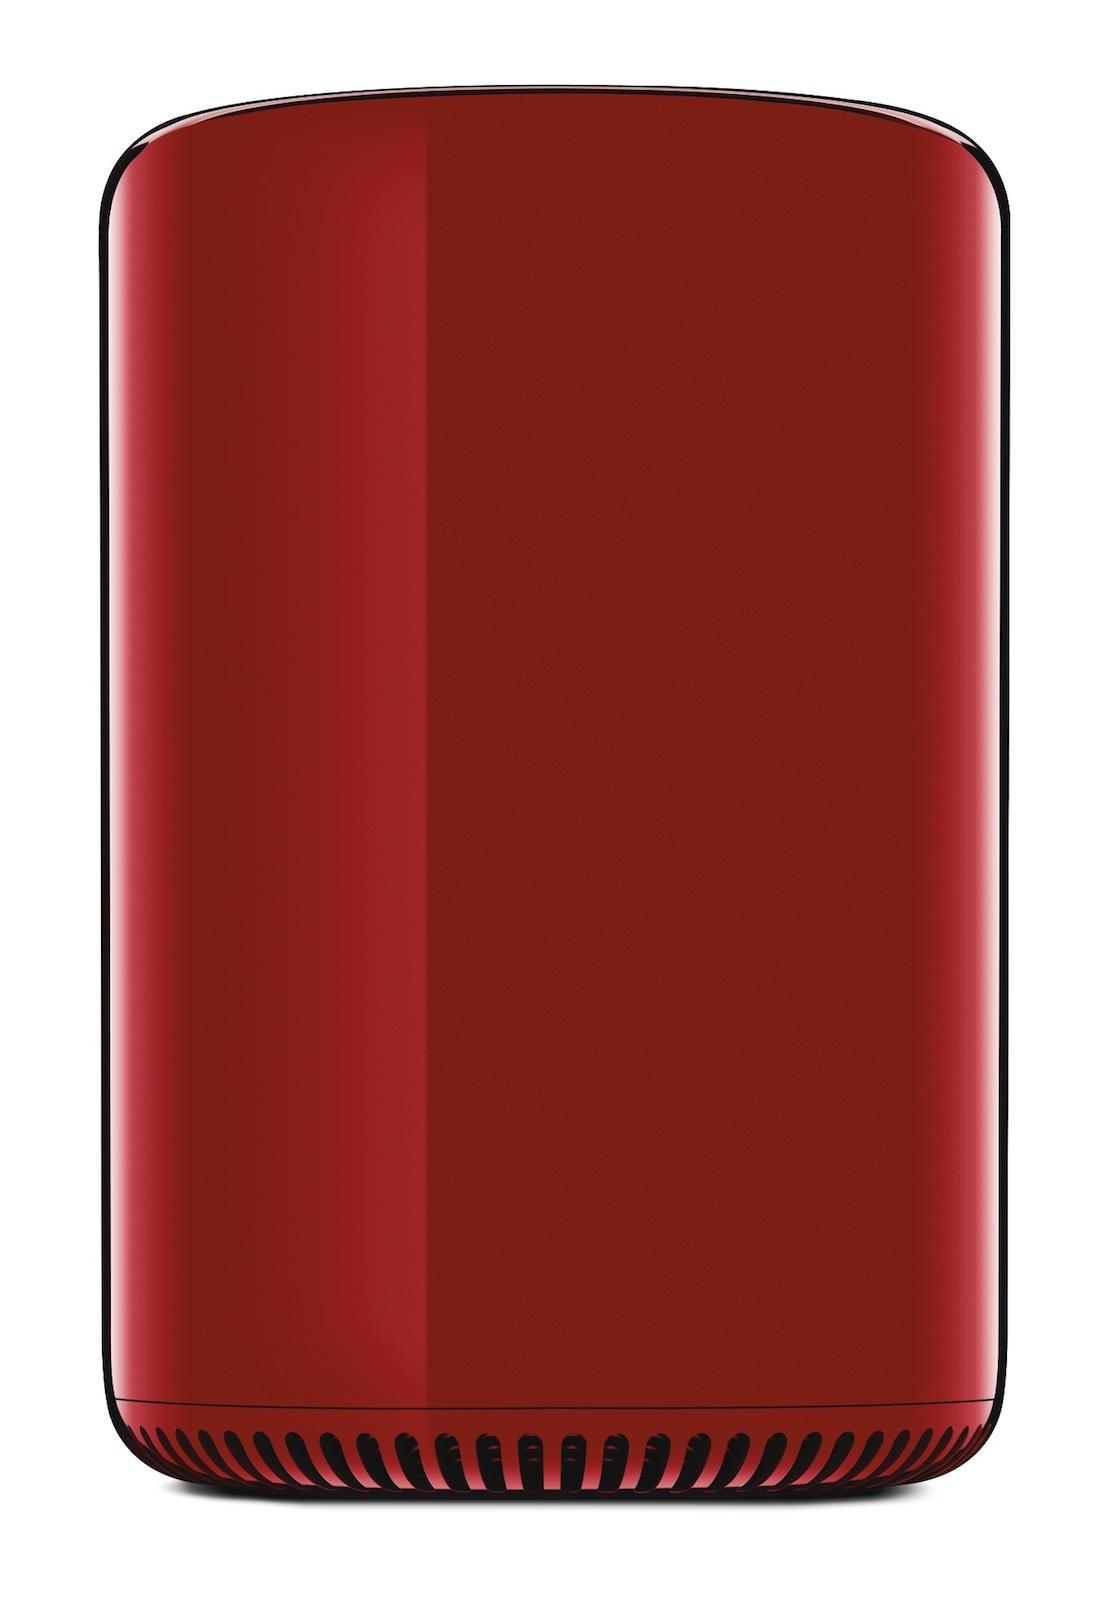 Mac Pro Red 3